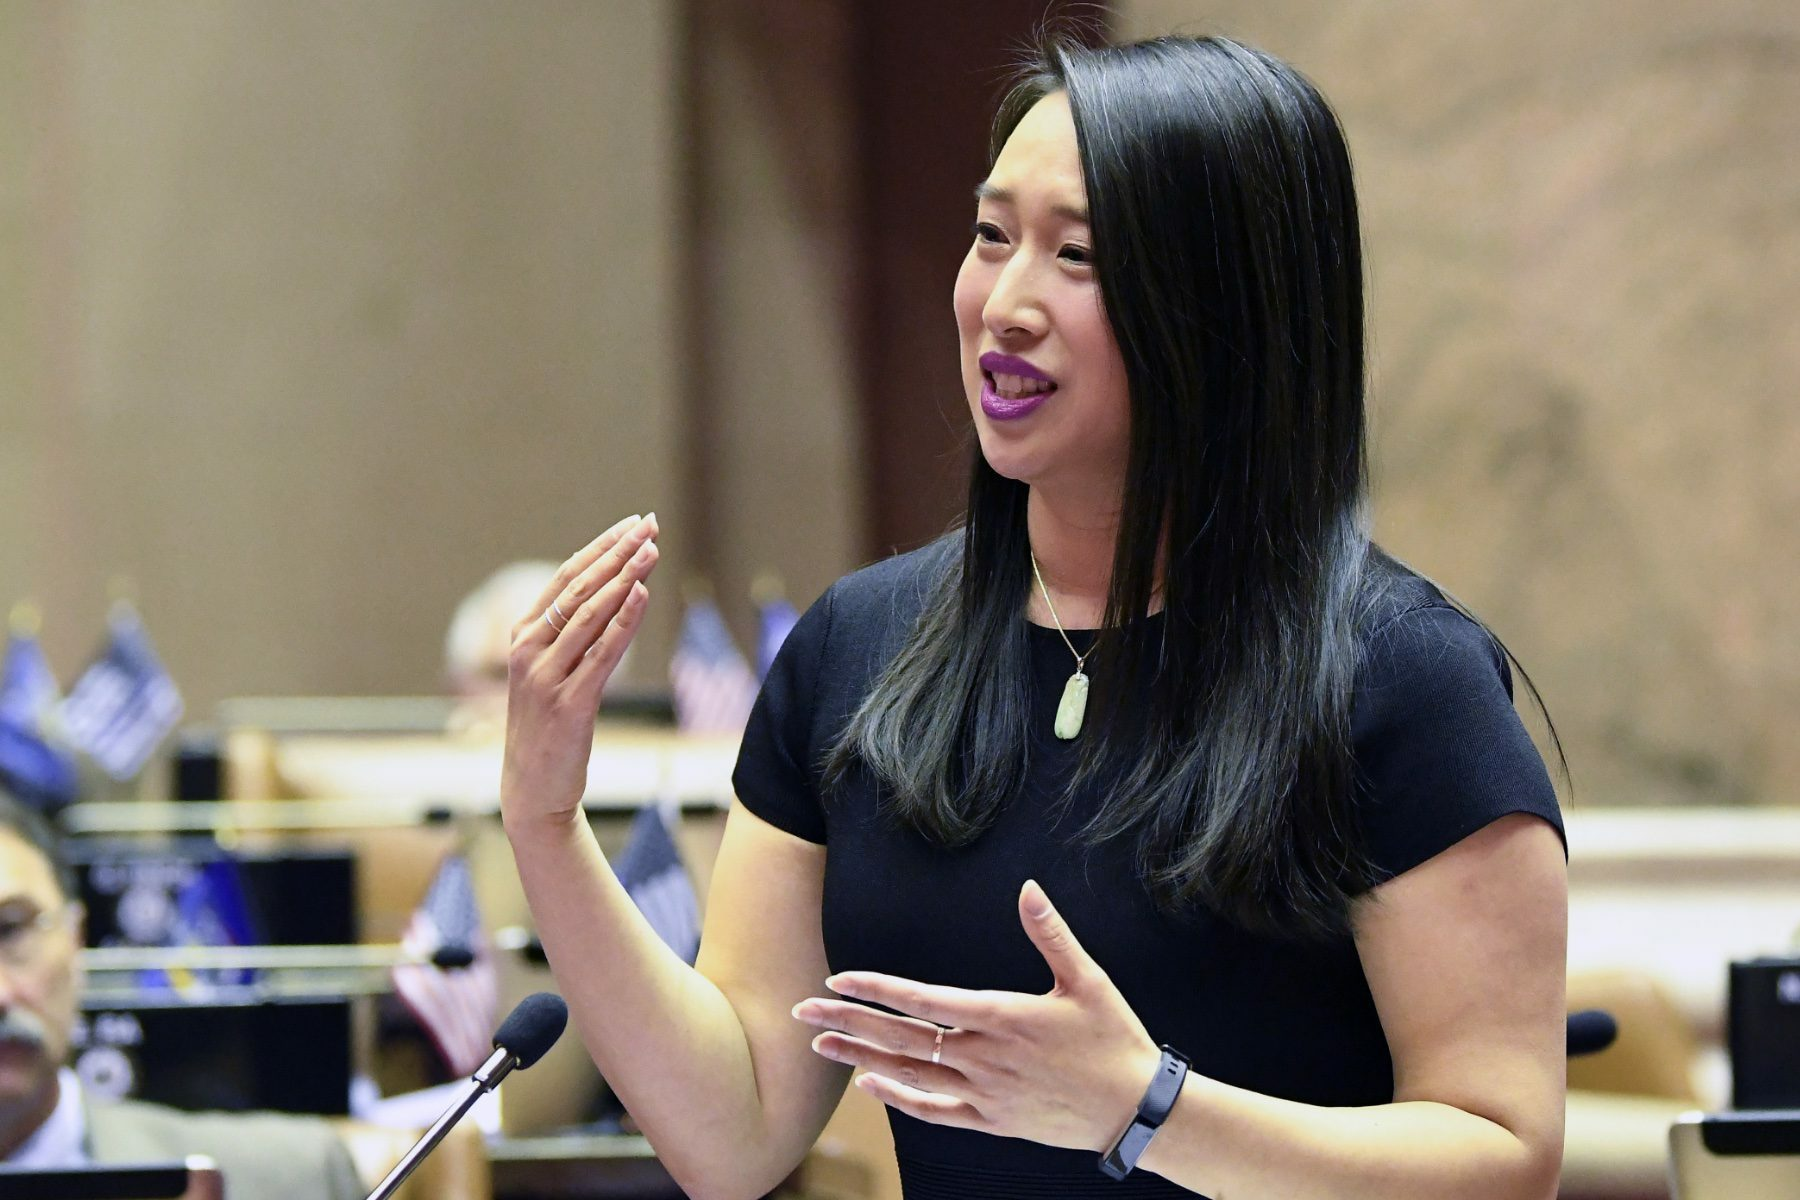 New York Assemblywoman Yuh-Line Niou speaking at a podium.